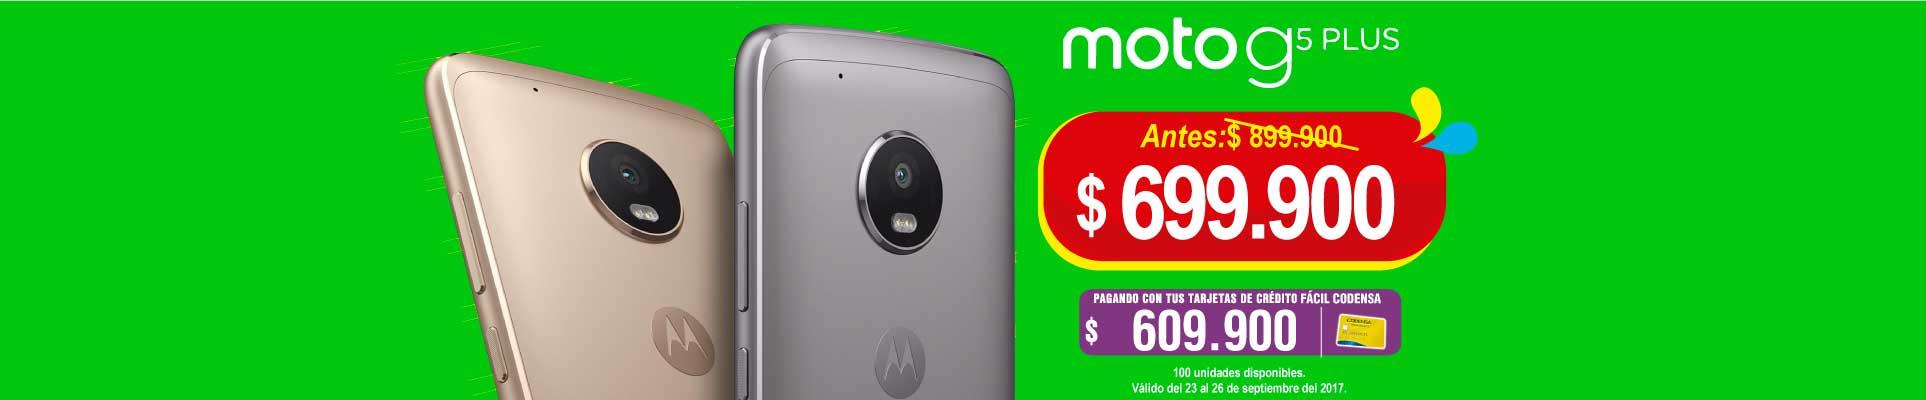 PPAL ALKP-1-celulares-Celular MOTOROLA Moto G5 Plus DS-prod-septiembre23-26